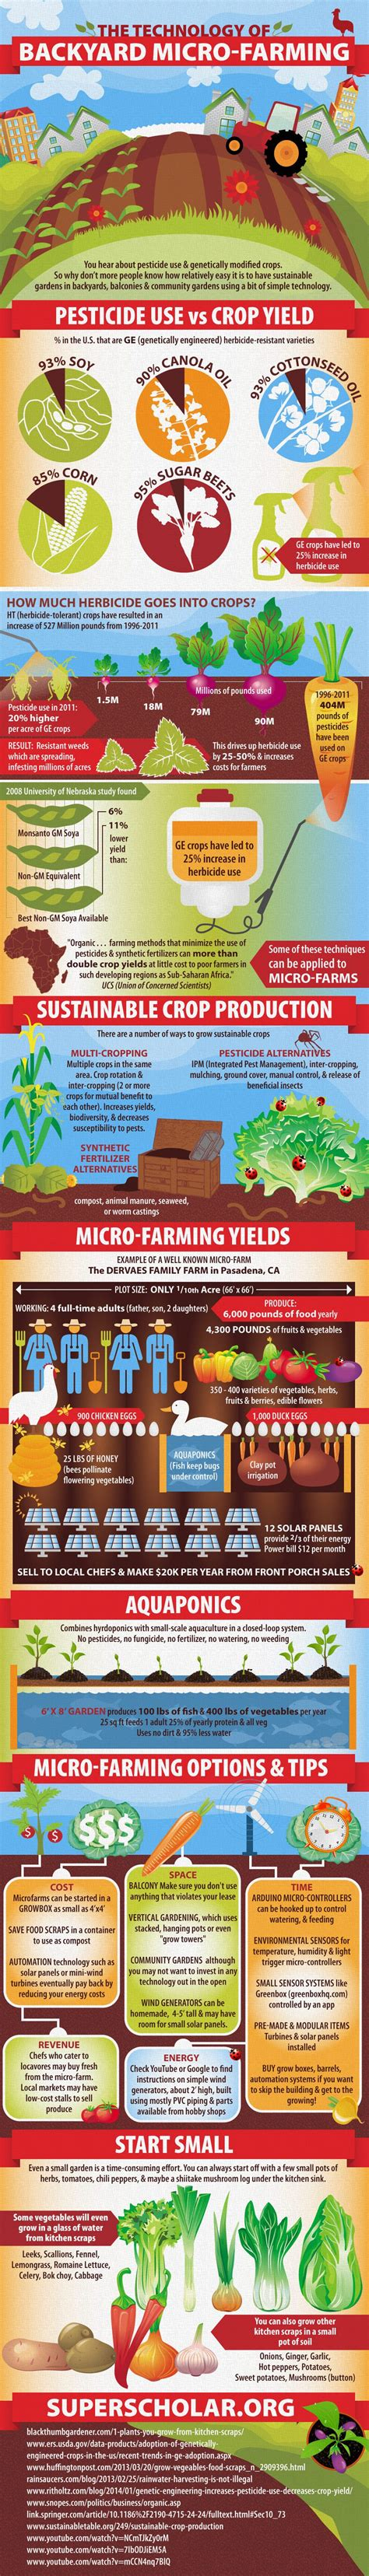 backyard farming the technology of backyard micro farming super scholar